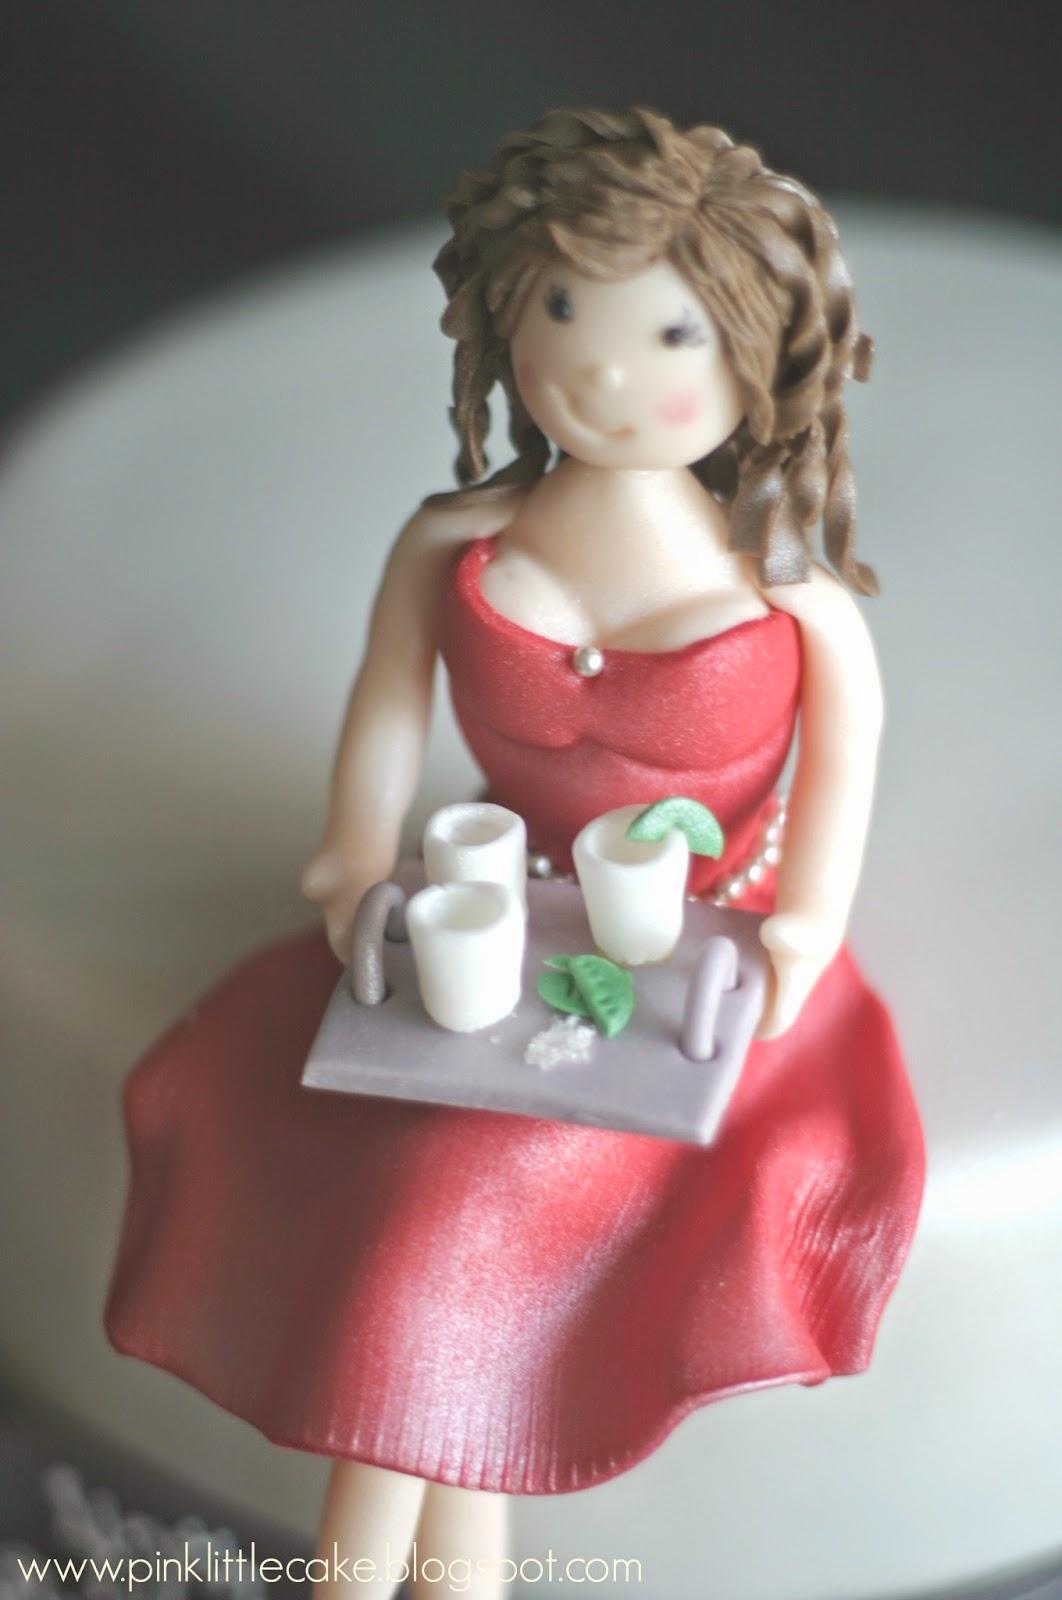 Pink Little Cake 40th Birthday Cake